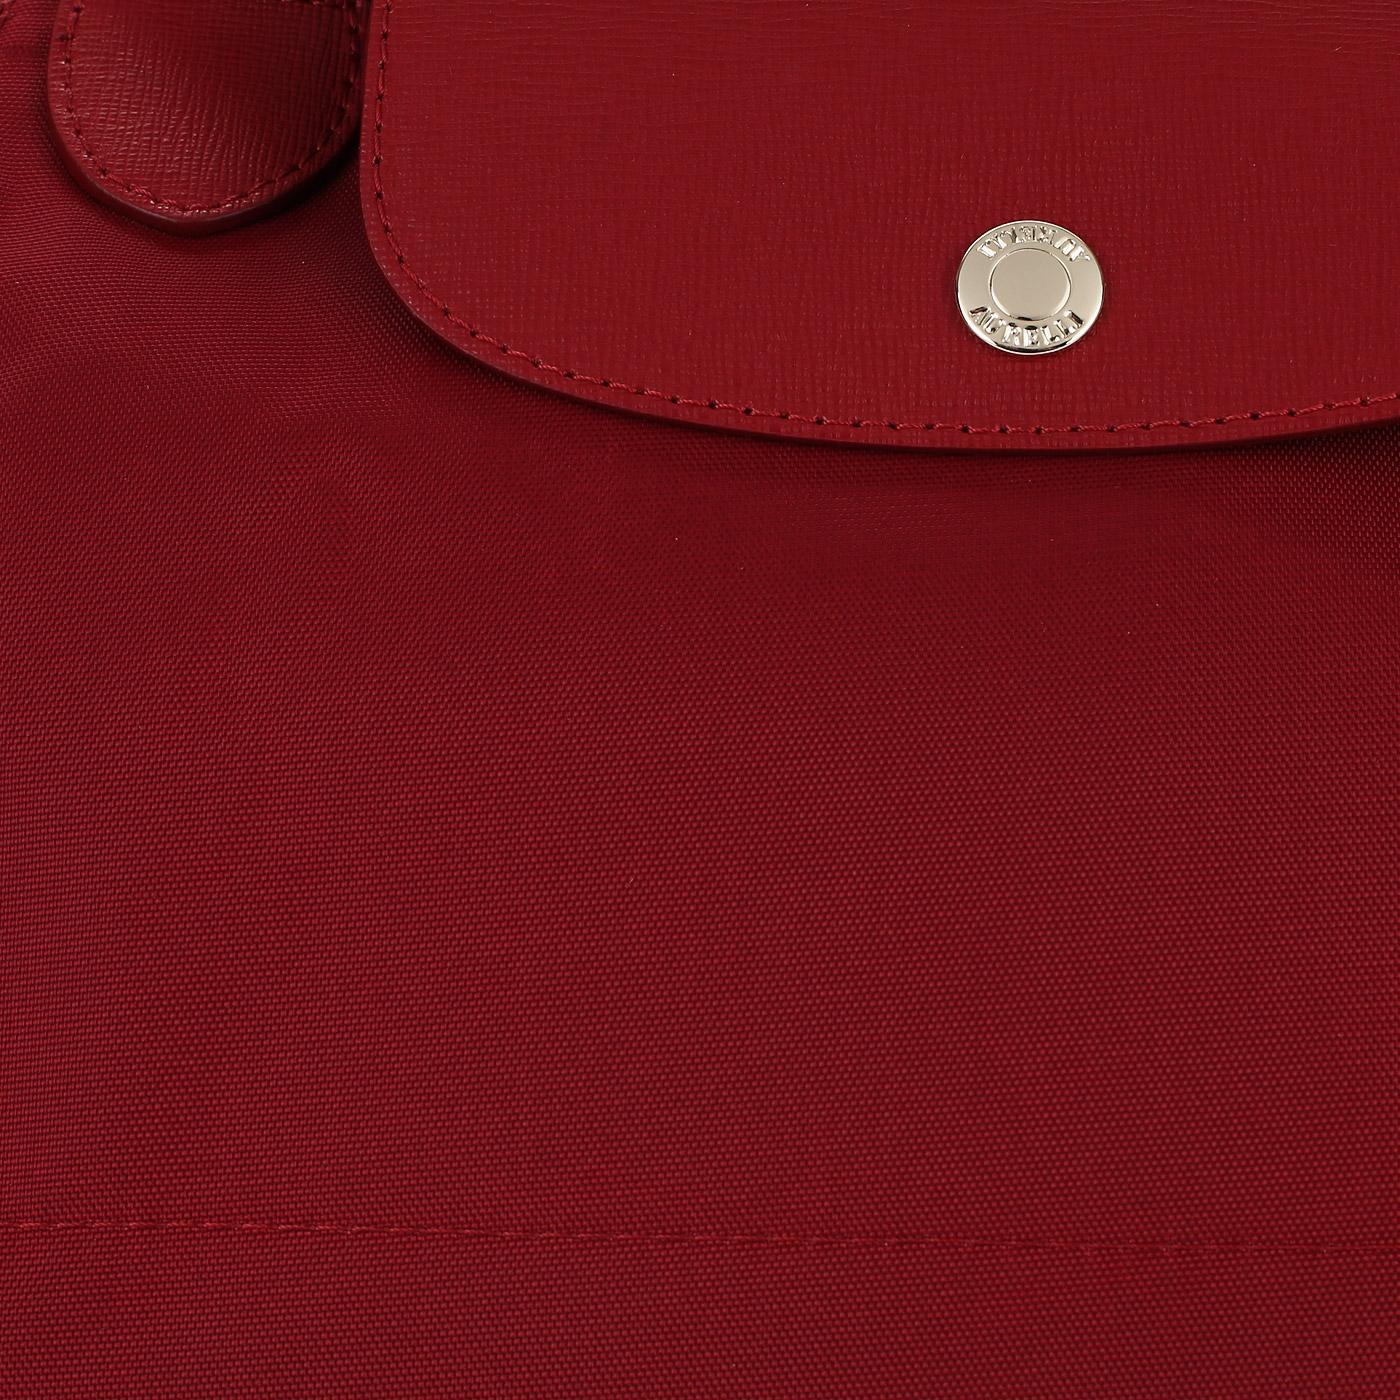 f7e6160400f4 Складная сумка-шоппер Aurelli S18006G_rosso - 2000557859920 красный ...